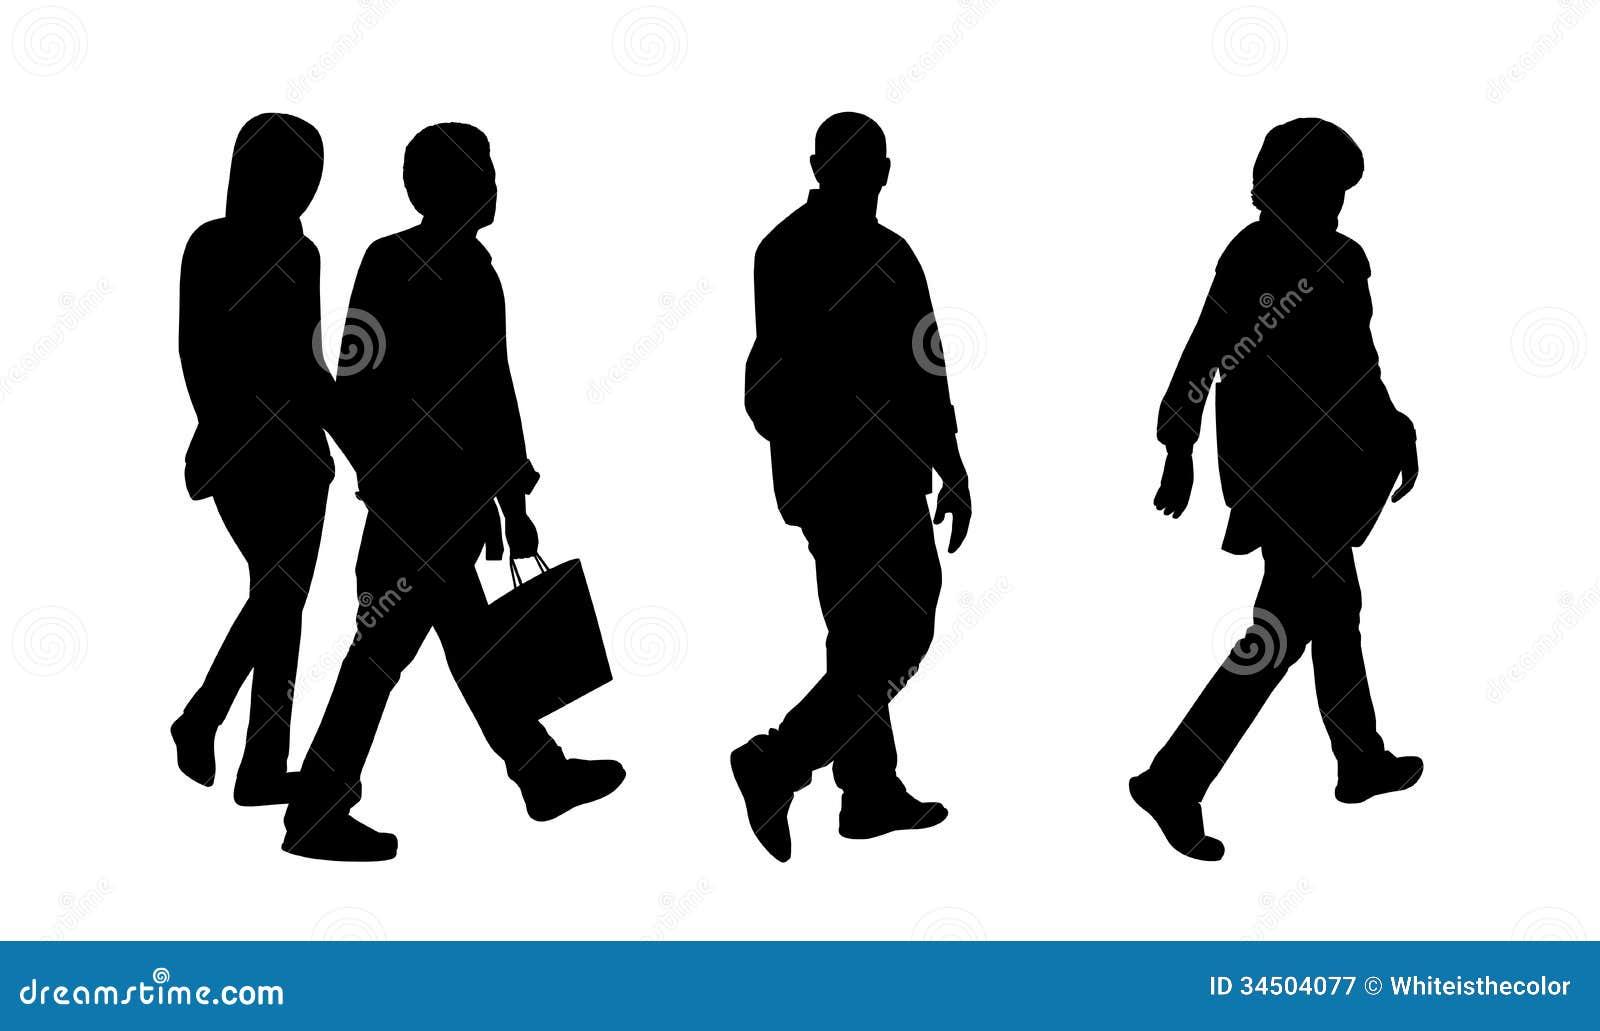 Silhouette Of People Walking On Street: People Walking Outdoor Silhouettes Set 1 Royalty Free